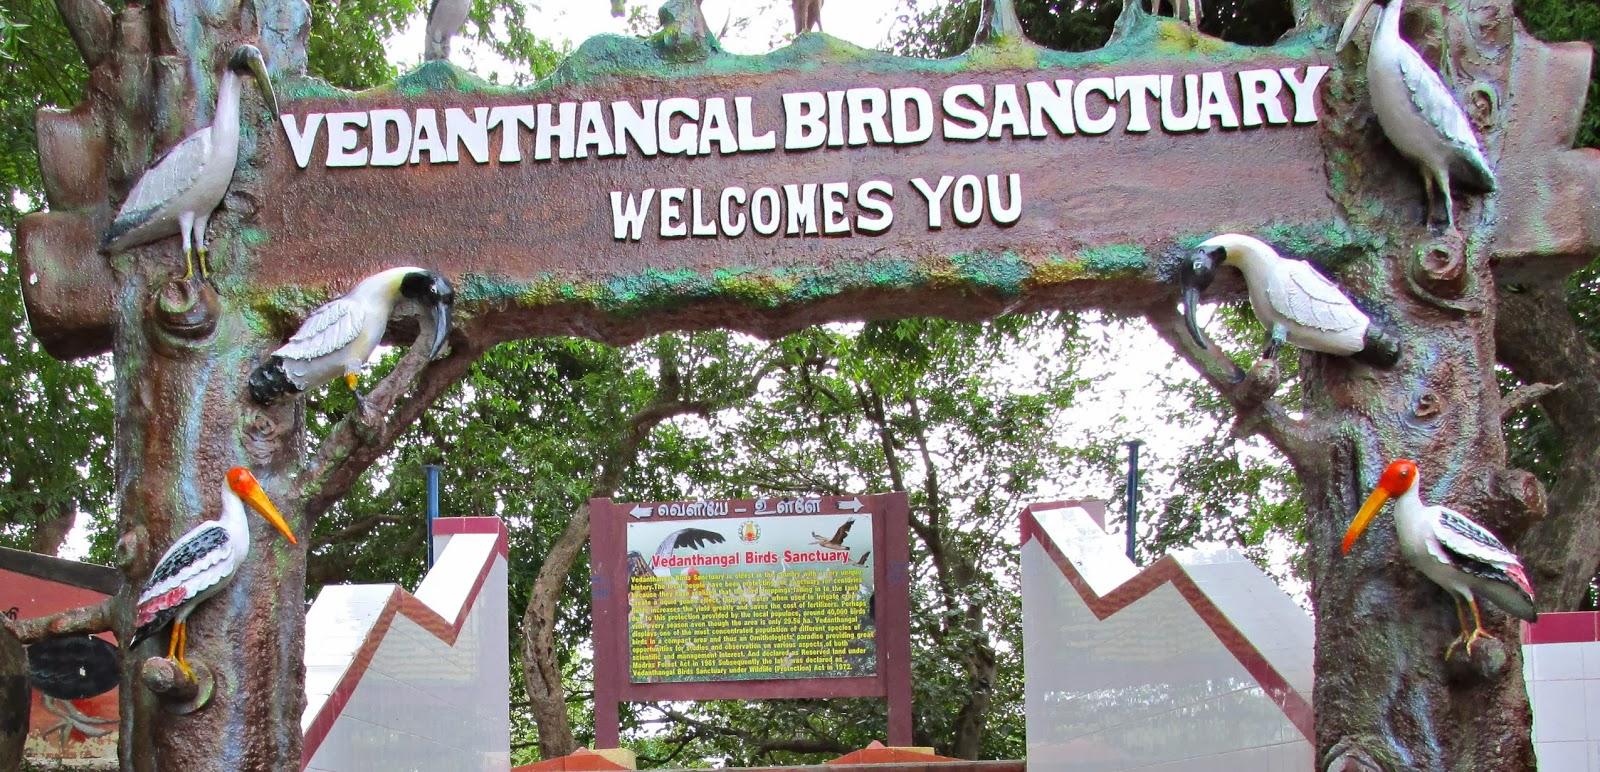 PhOto SyntHesiS: Vedanthangal Bird Sanctuary